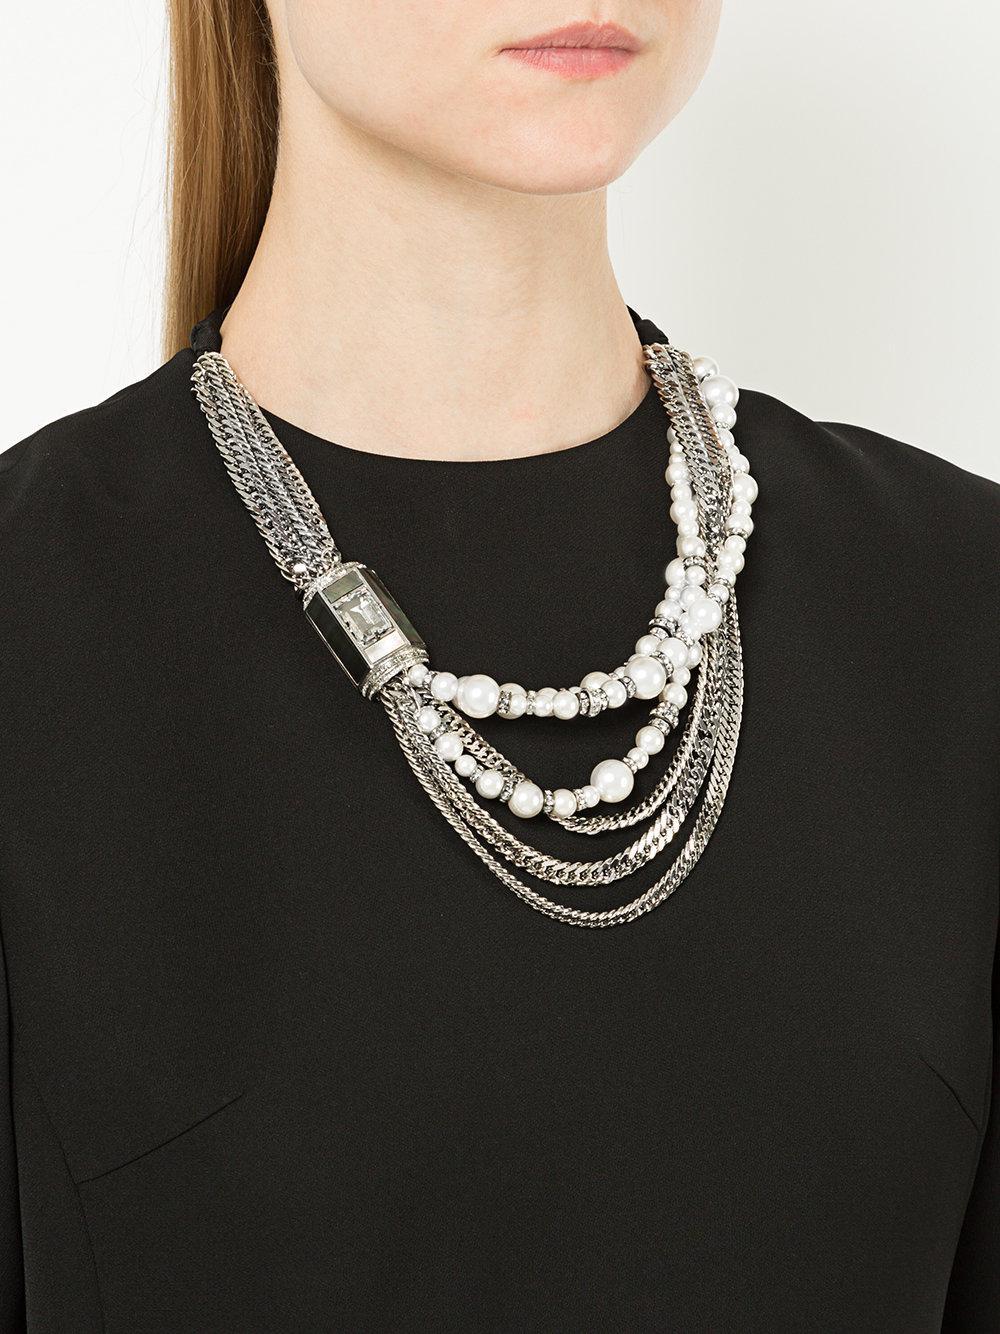 Lanvin embellished chain necklace - Metallic yfNWYb7xkX